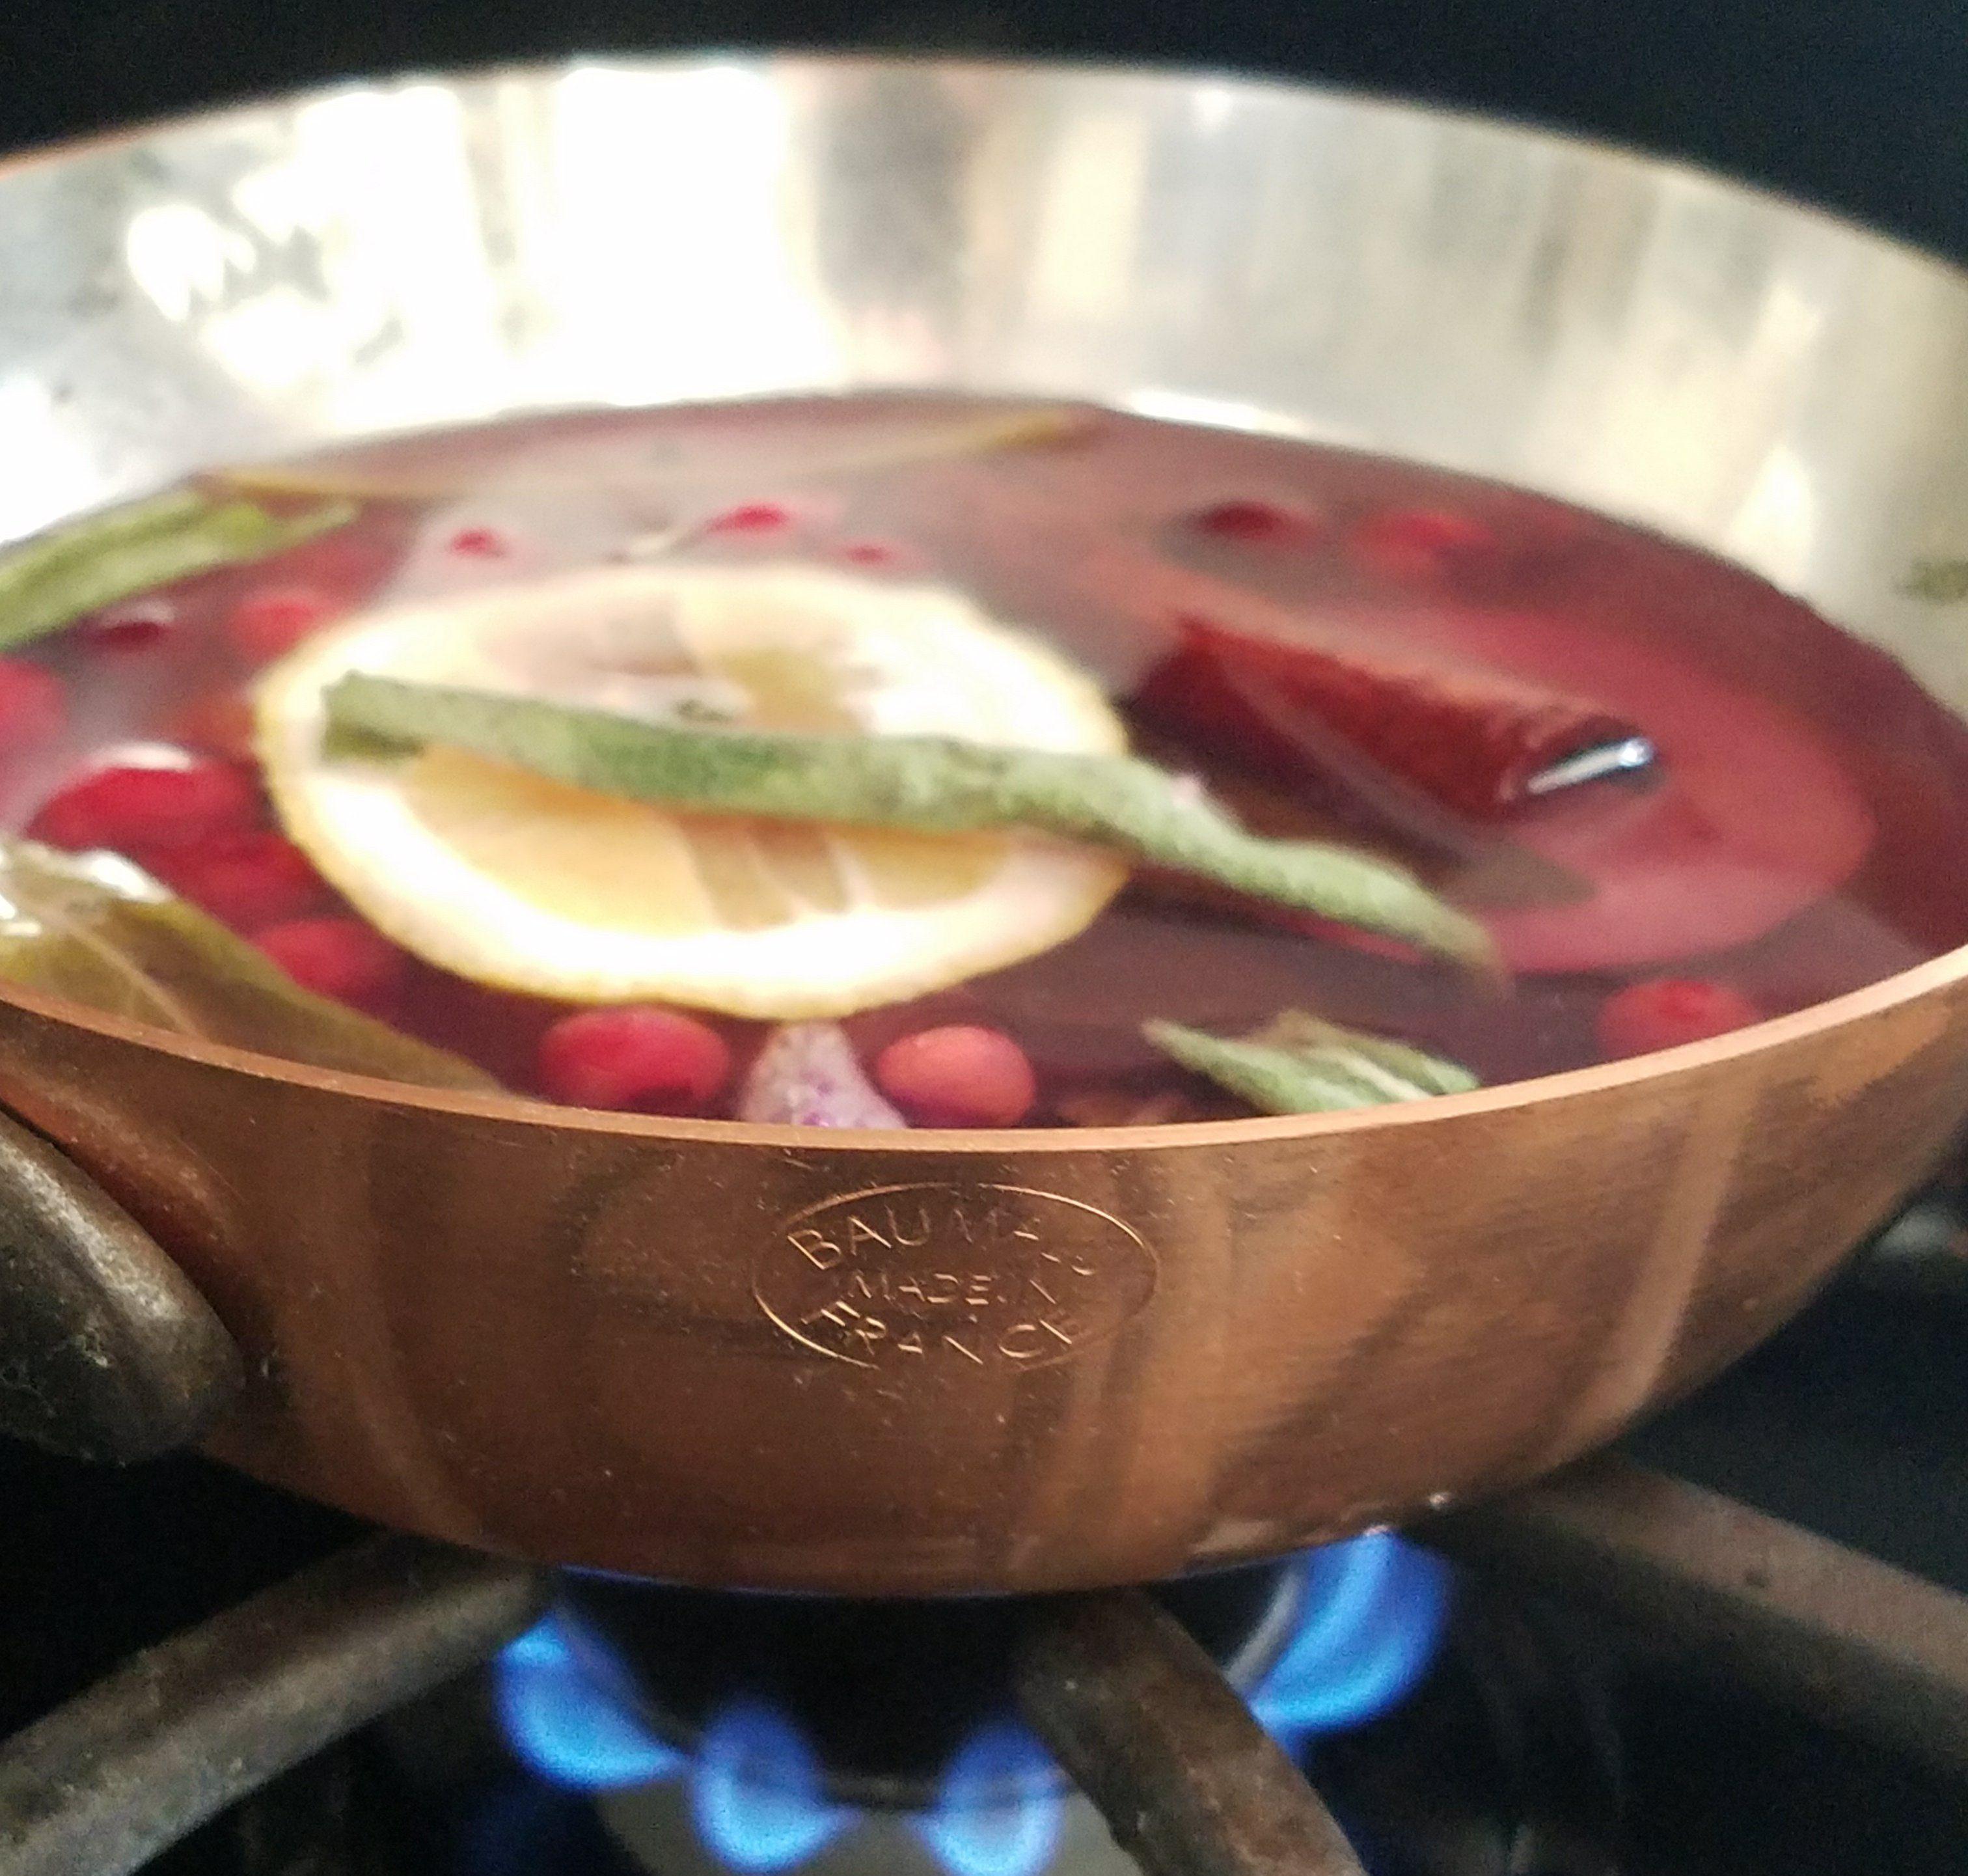 Cranberry, sage, bay, cinnamon simmer potpourri